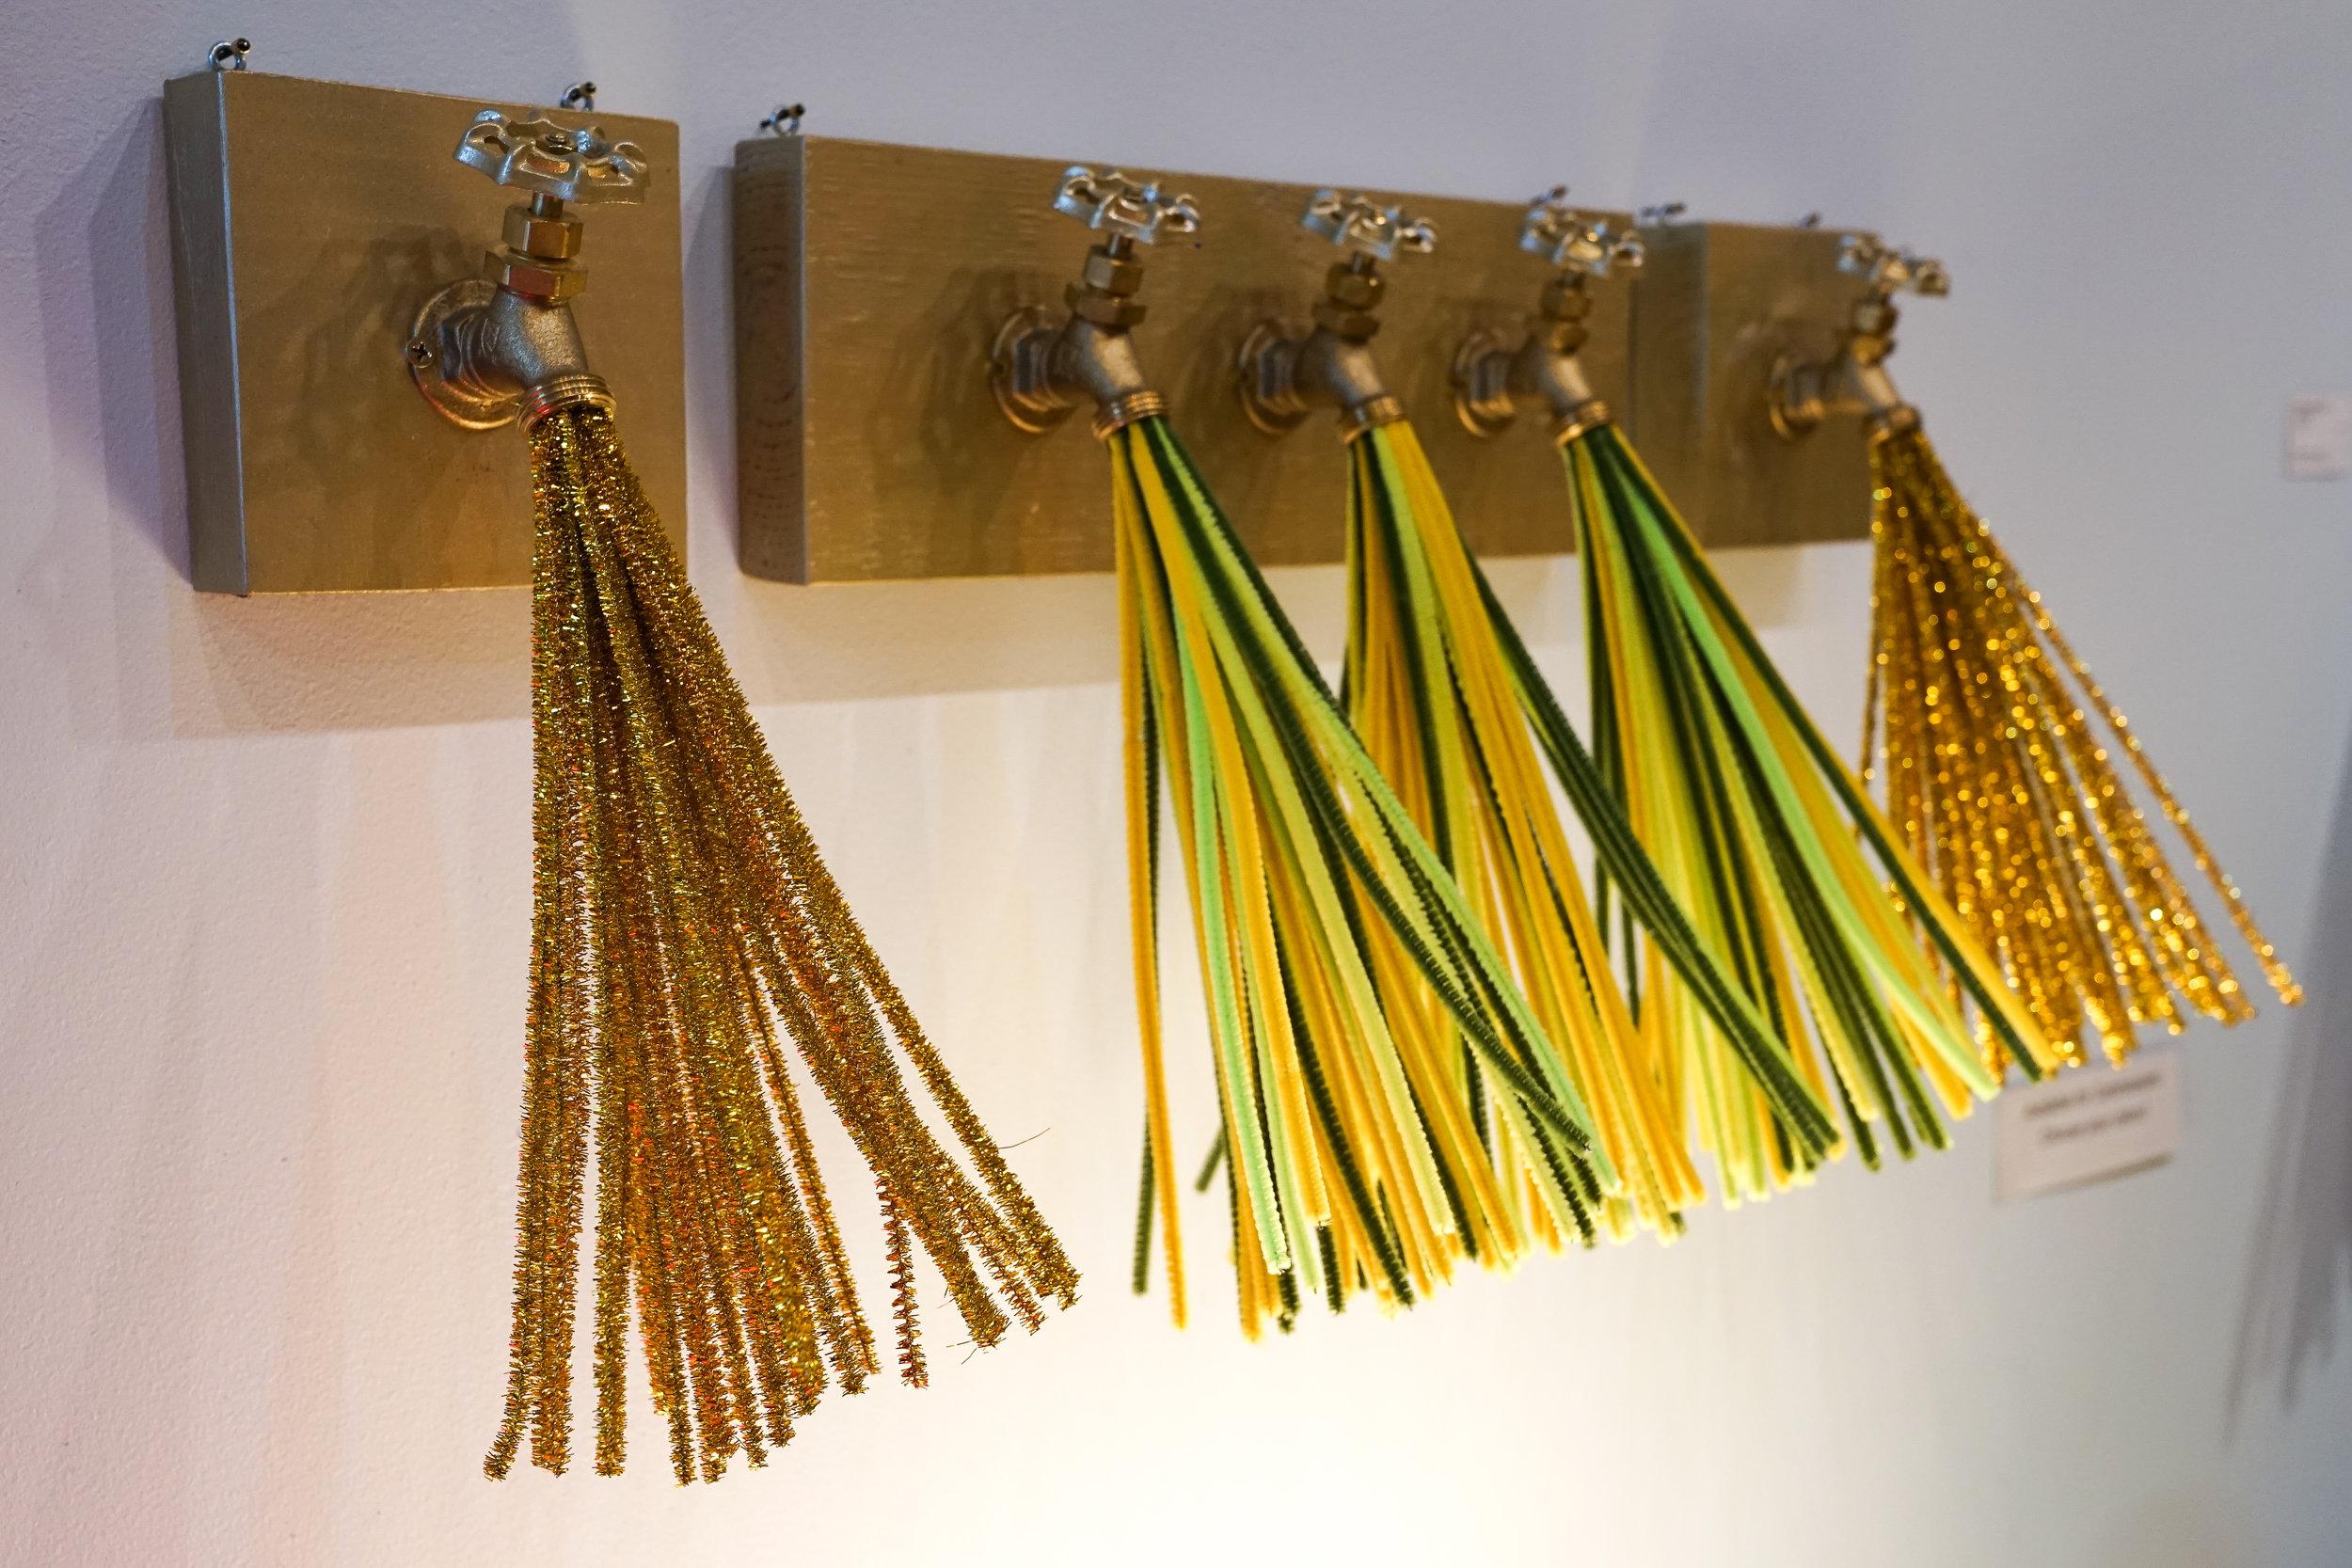 Hallie Rae Ward - East Austin Studio Tour - Waterworks series - Austin Art - Austin Artist - Contemporary Art